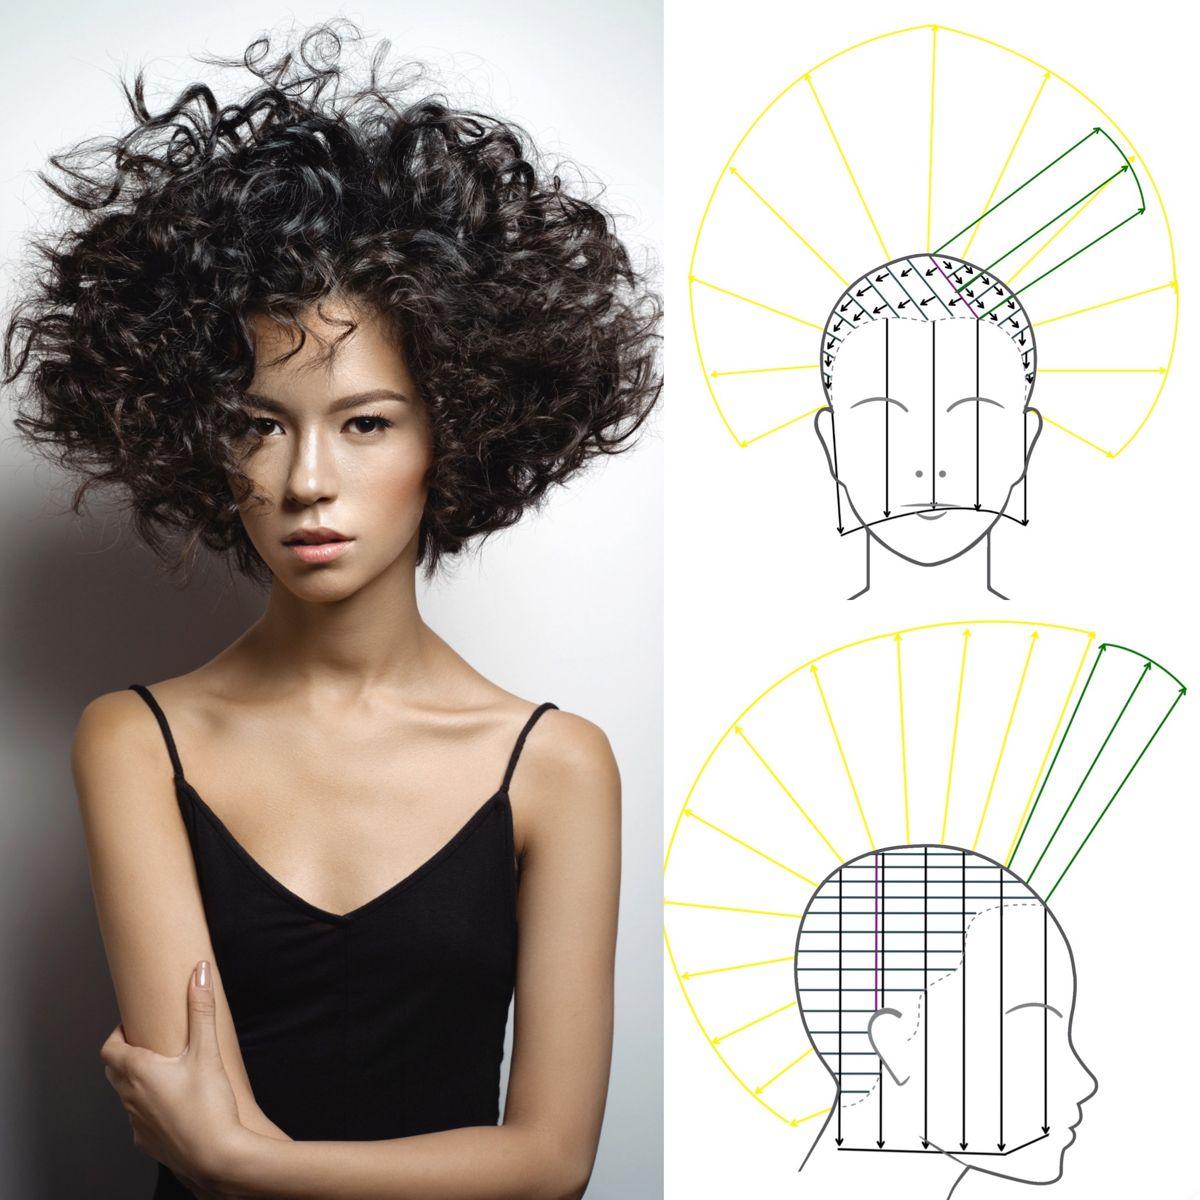 Curly Hair 2020 Lockige Frisuren Frisur Dicke Haare Haarschnitt Ideen